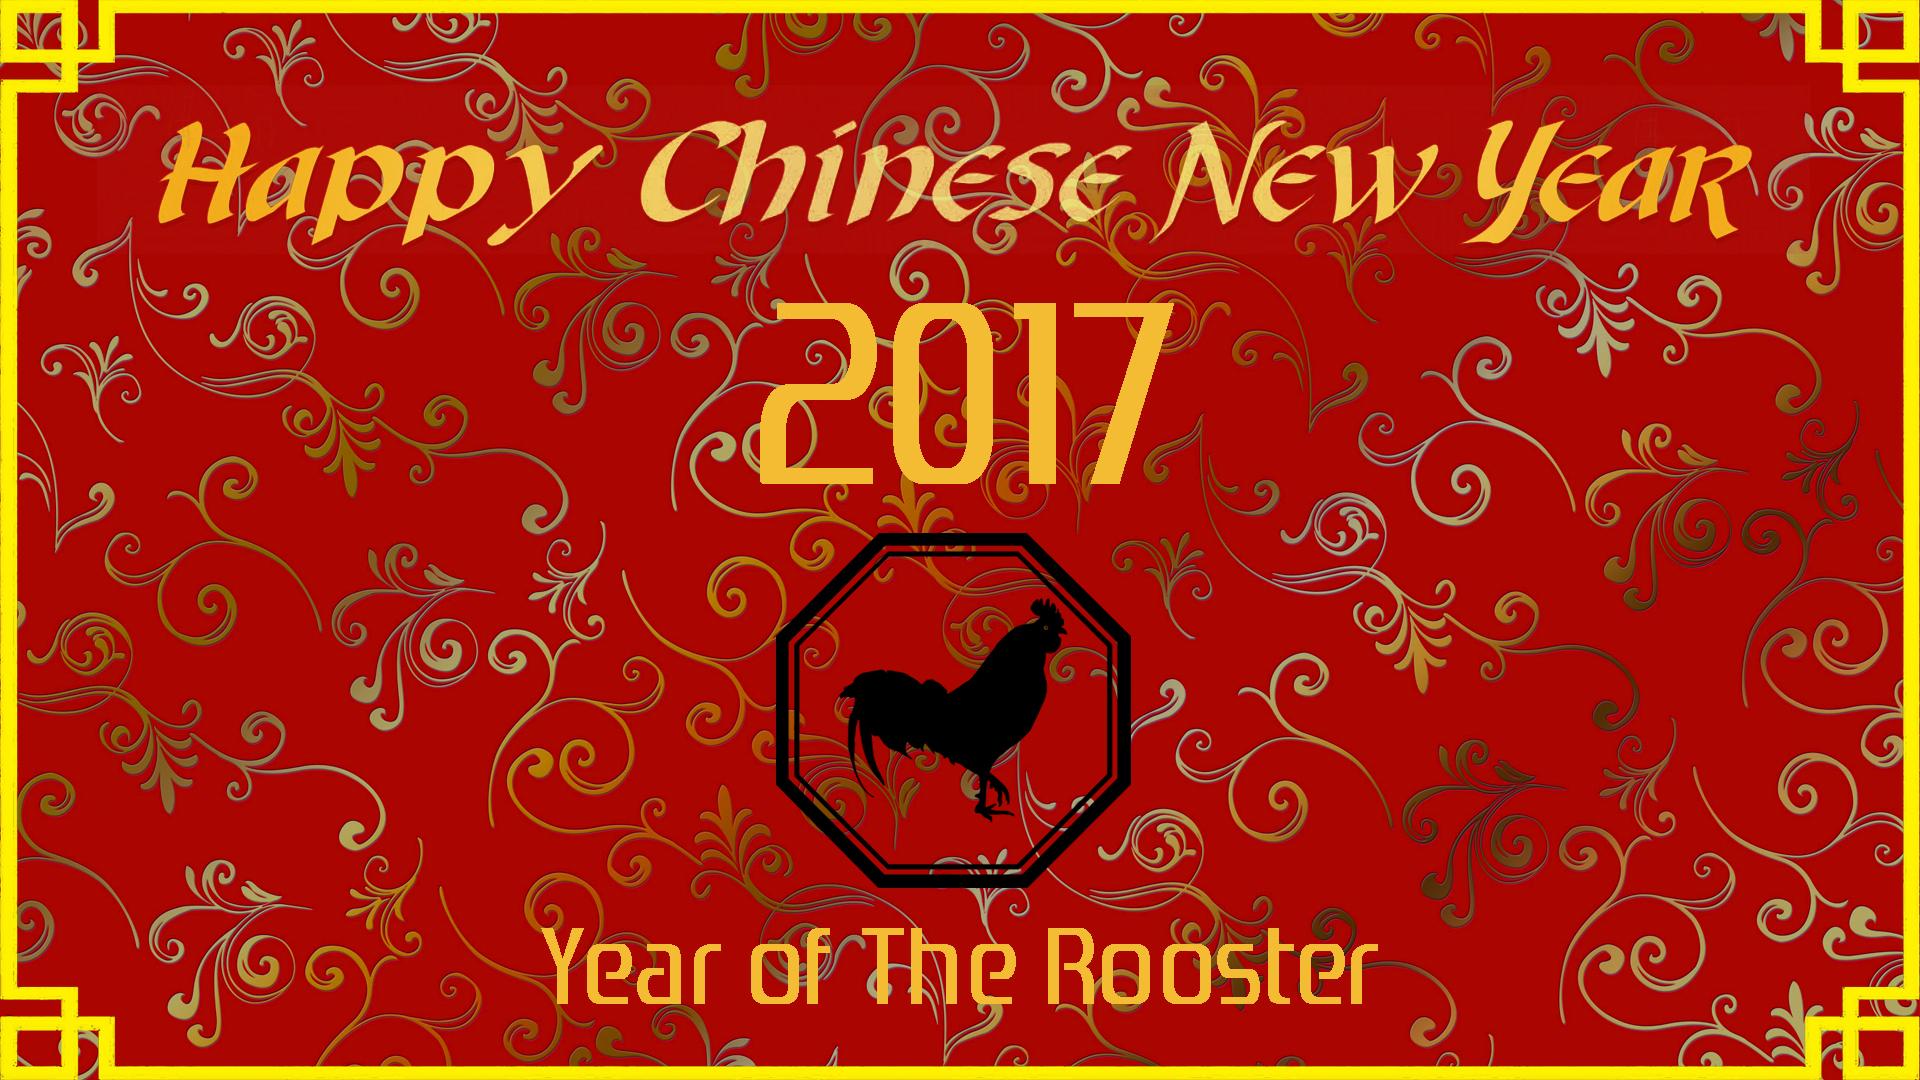 Chinese new year 2017 wallpaper year